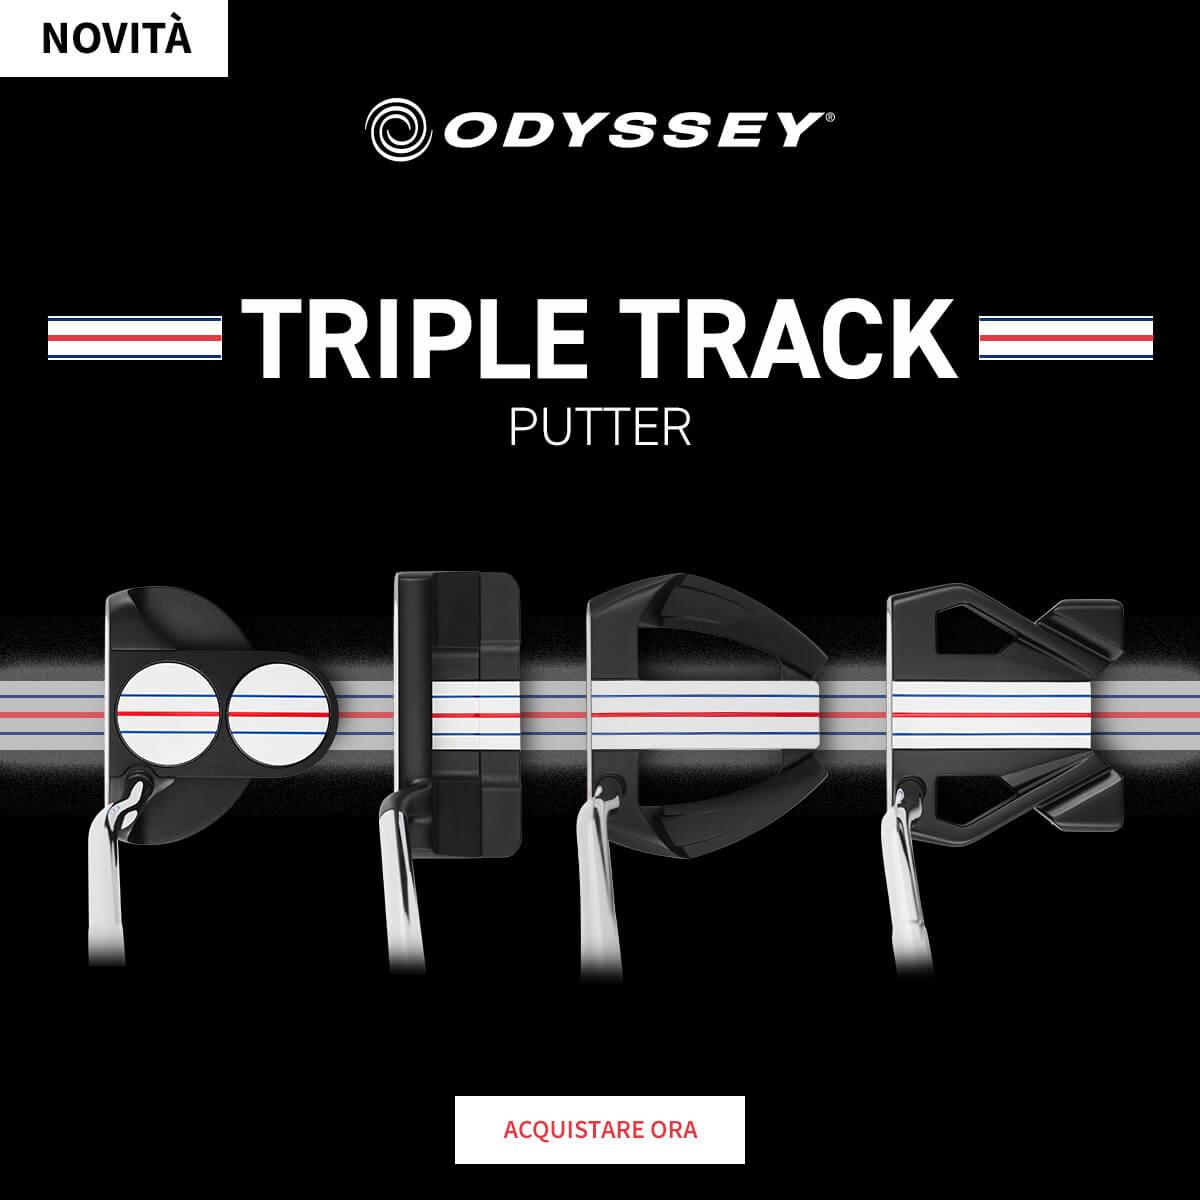 ODYSSEY TRIPLE TRACK